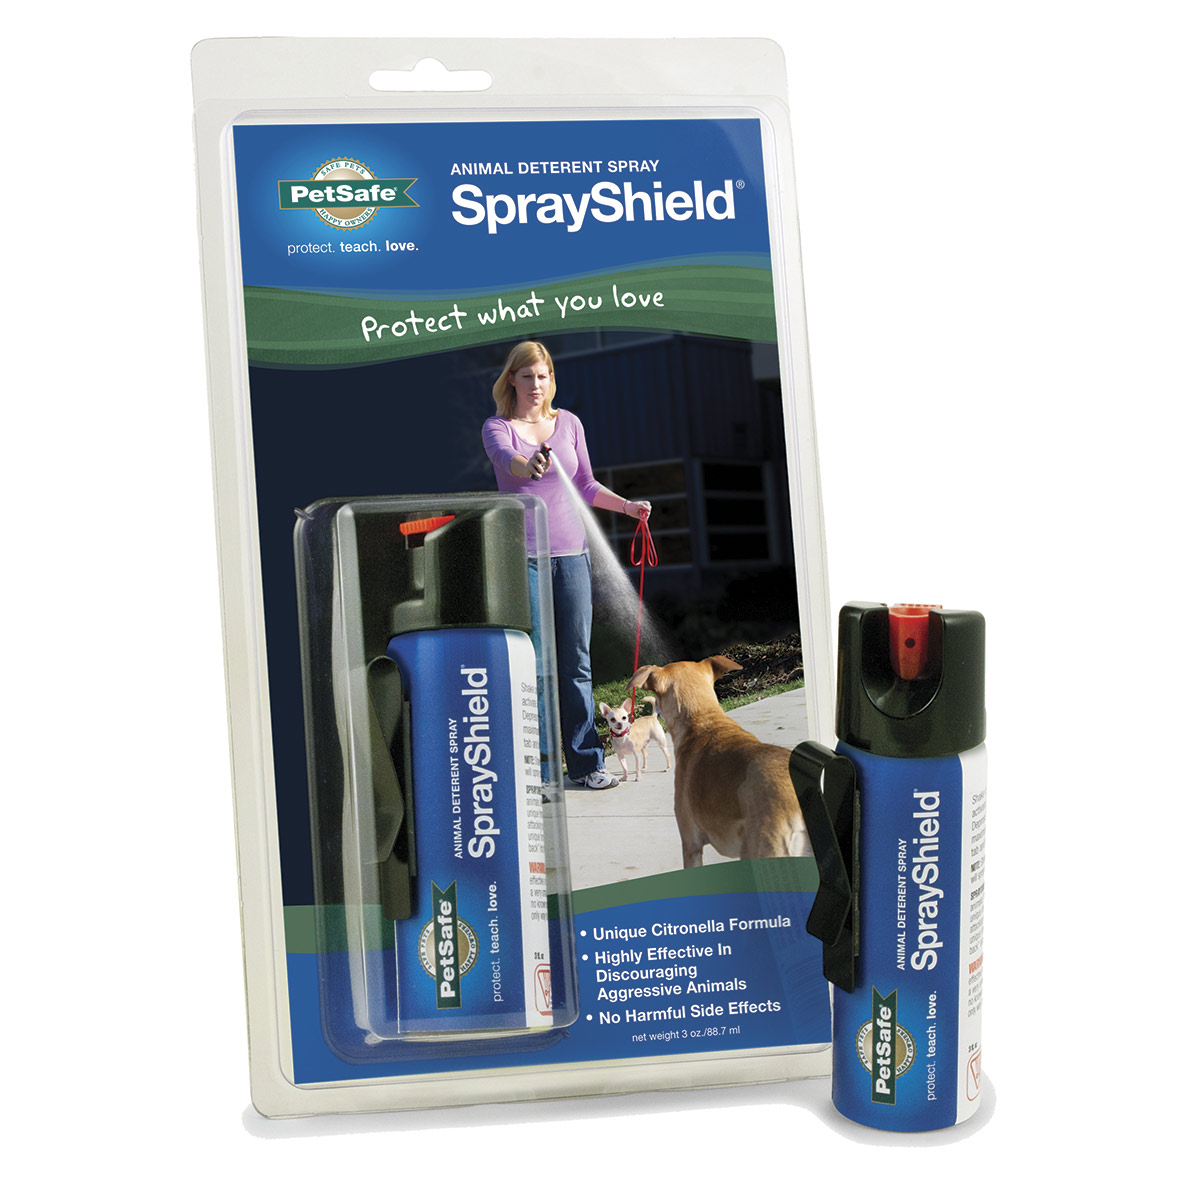 SprayShield Animal Deterrent Spray with Citronella 3 oz